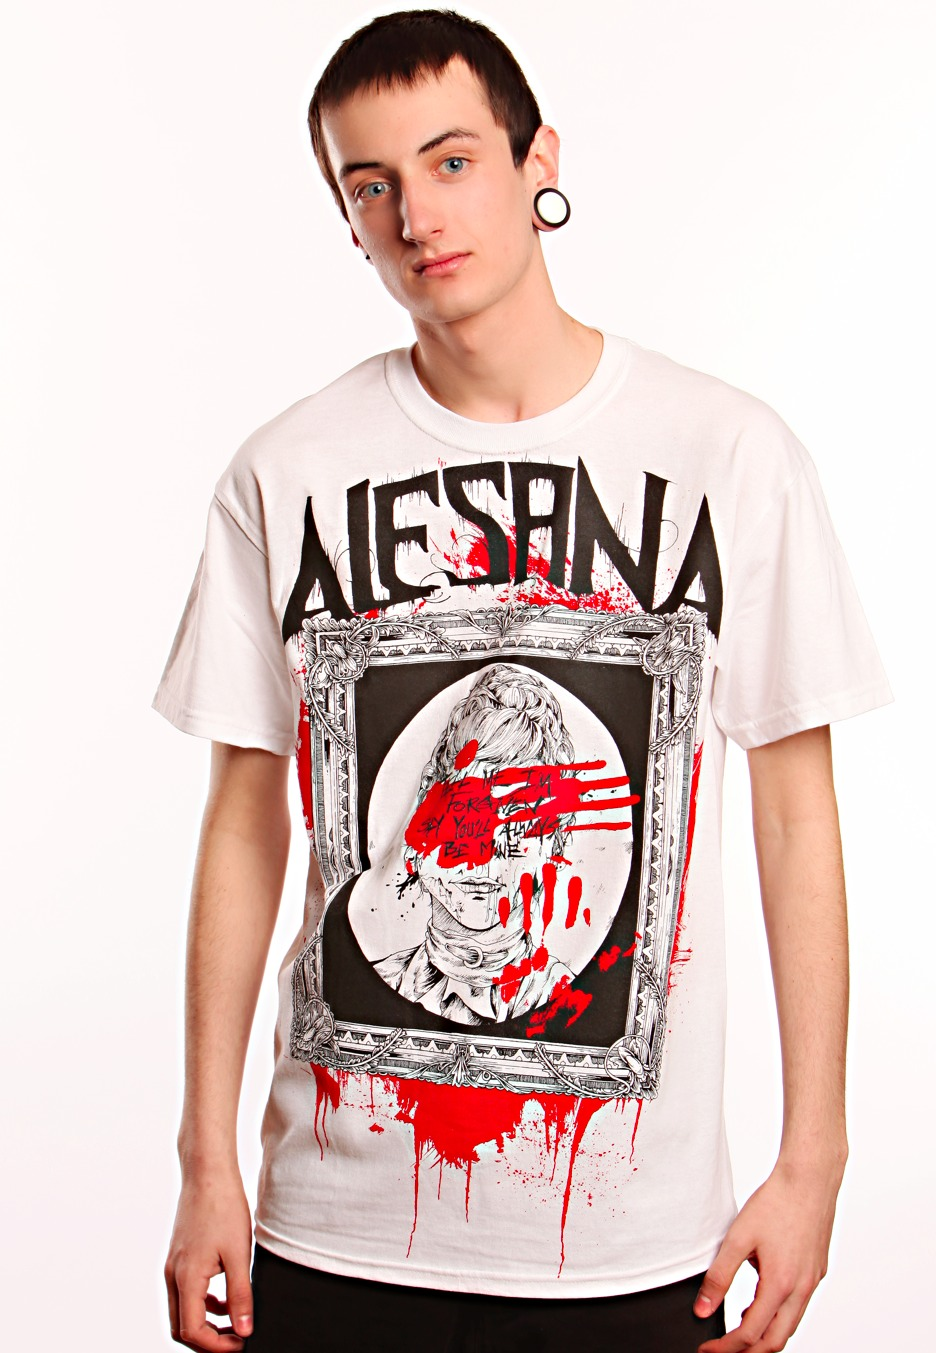 Alesana hoodie